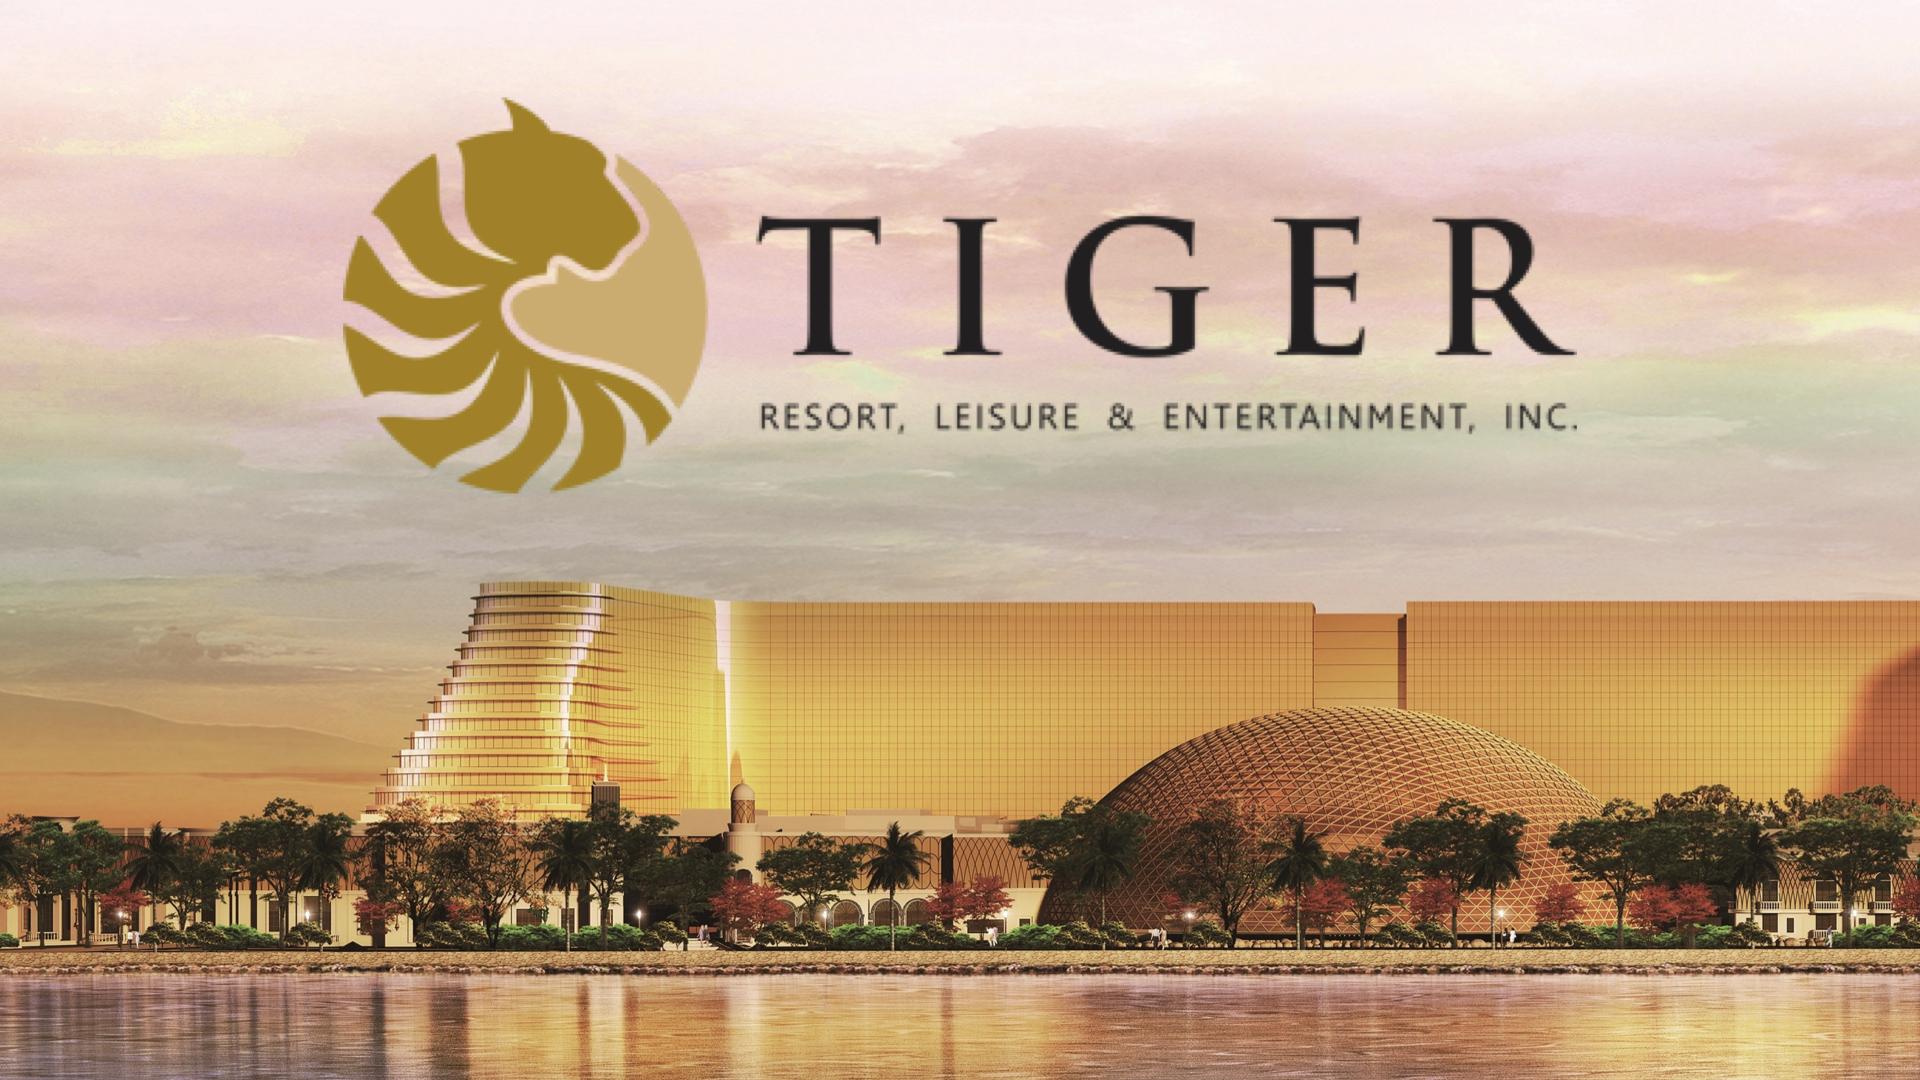 Tiger Resort, Leisure & Entertainment